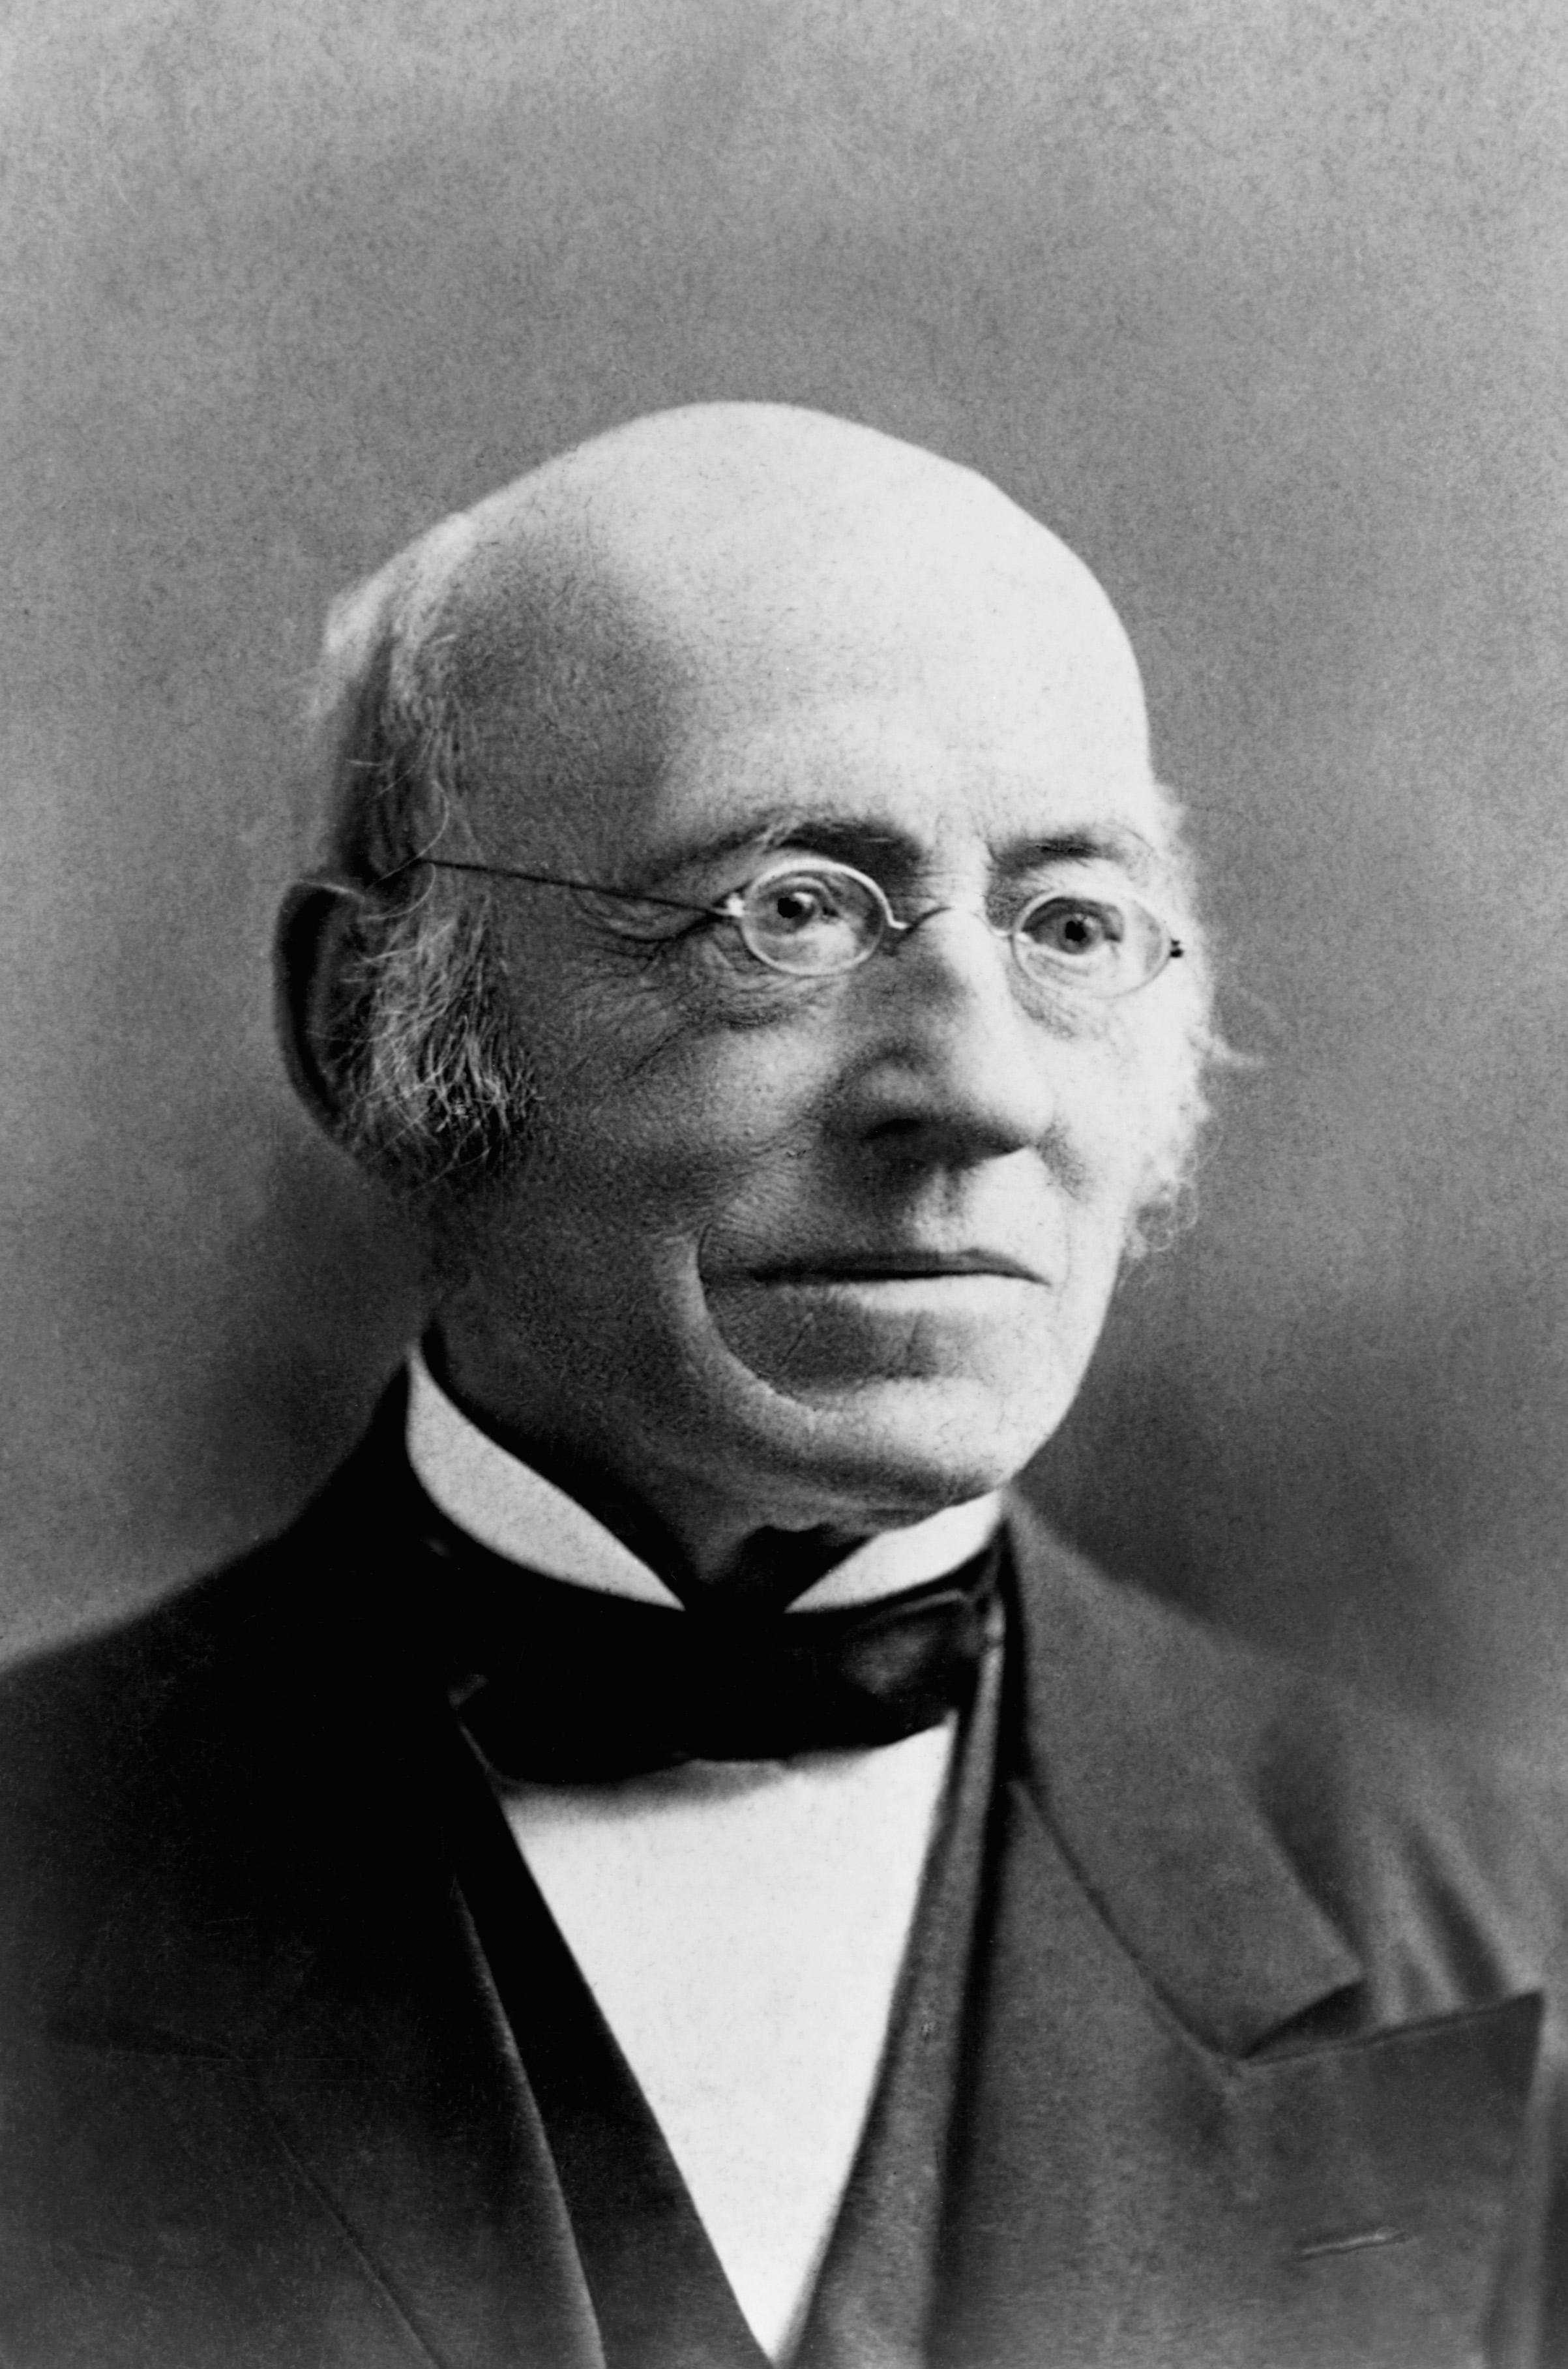 Abolitionist William Lloyd Garrison